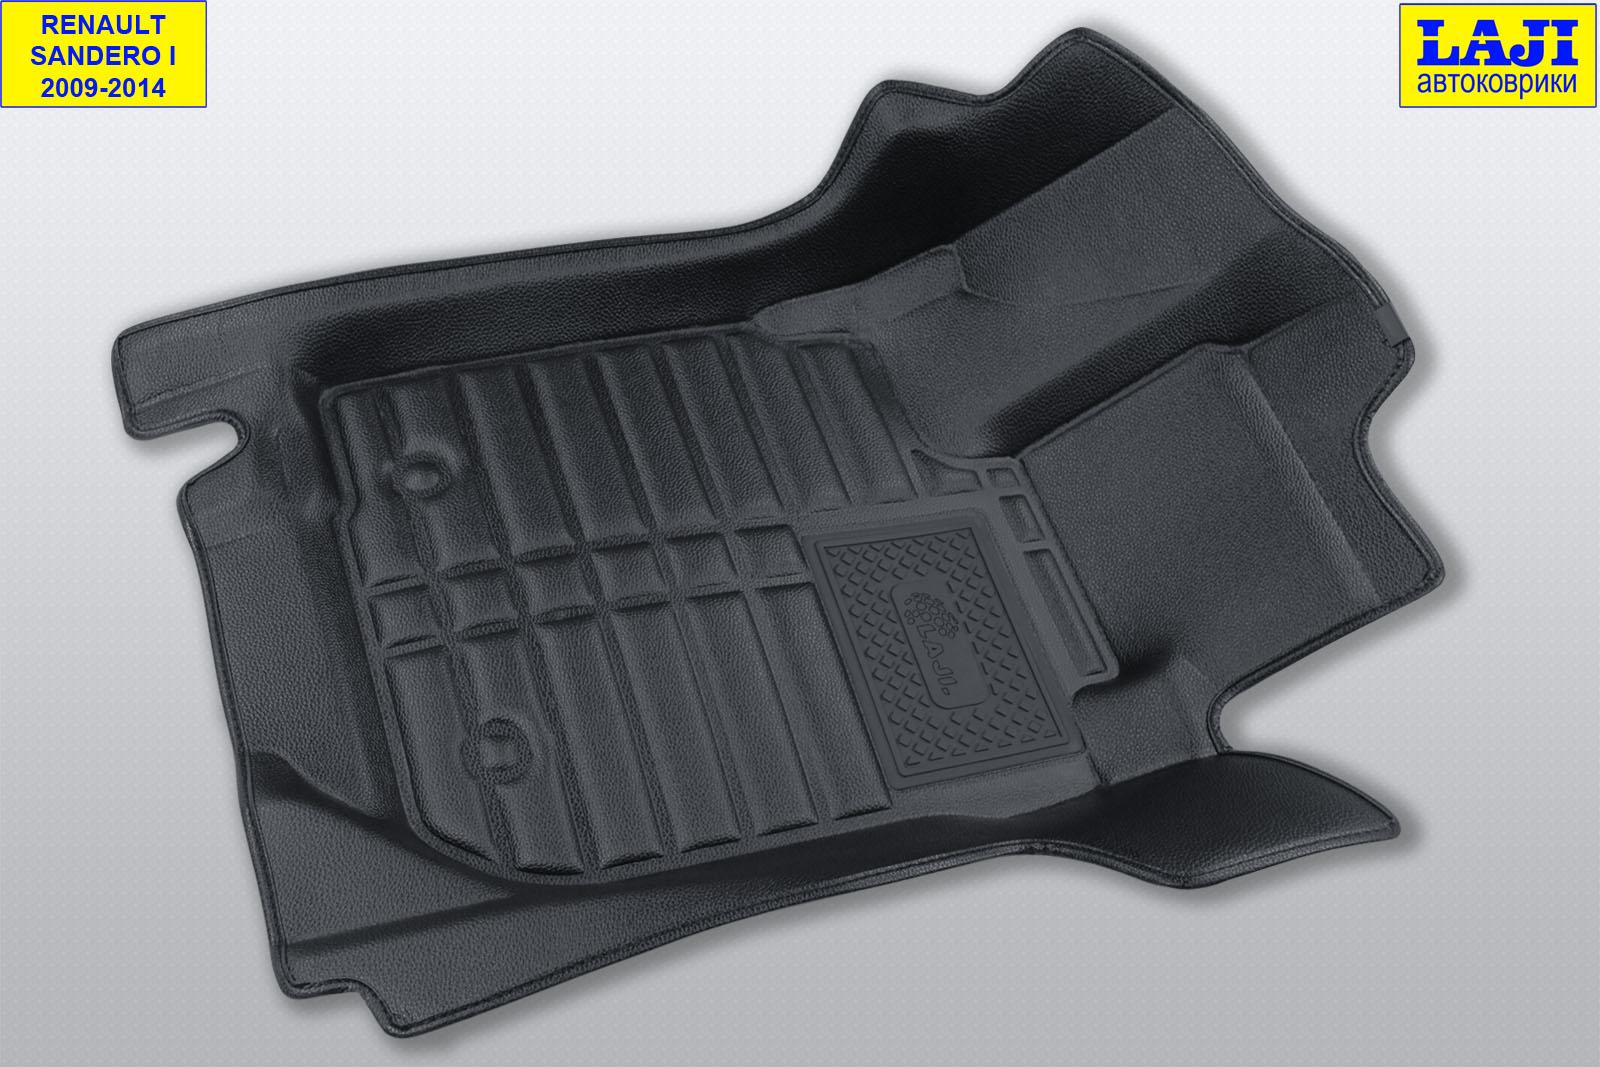 5D коврики в салон Renault Sandero 1 2009-2014 2